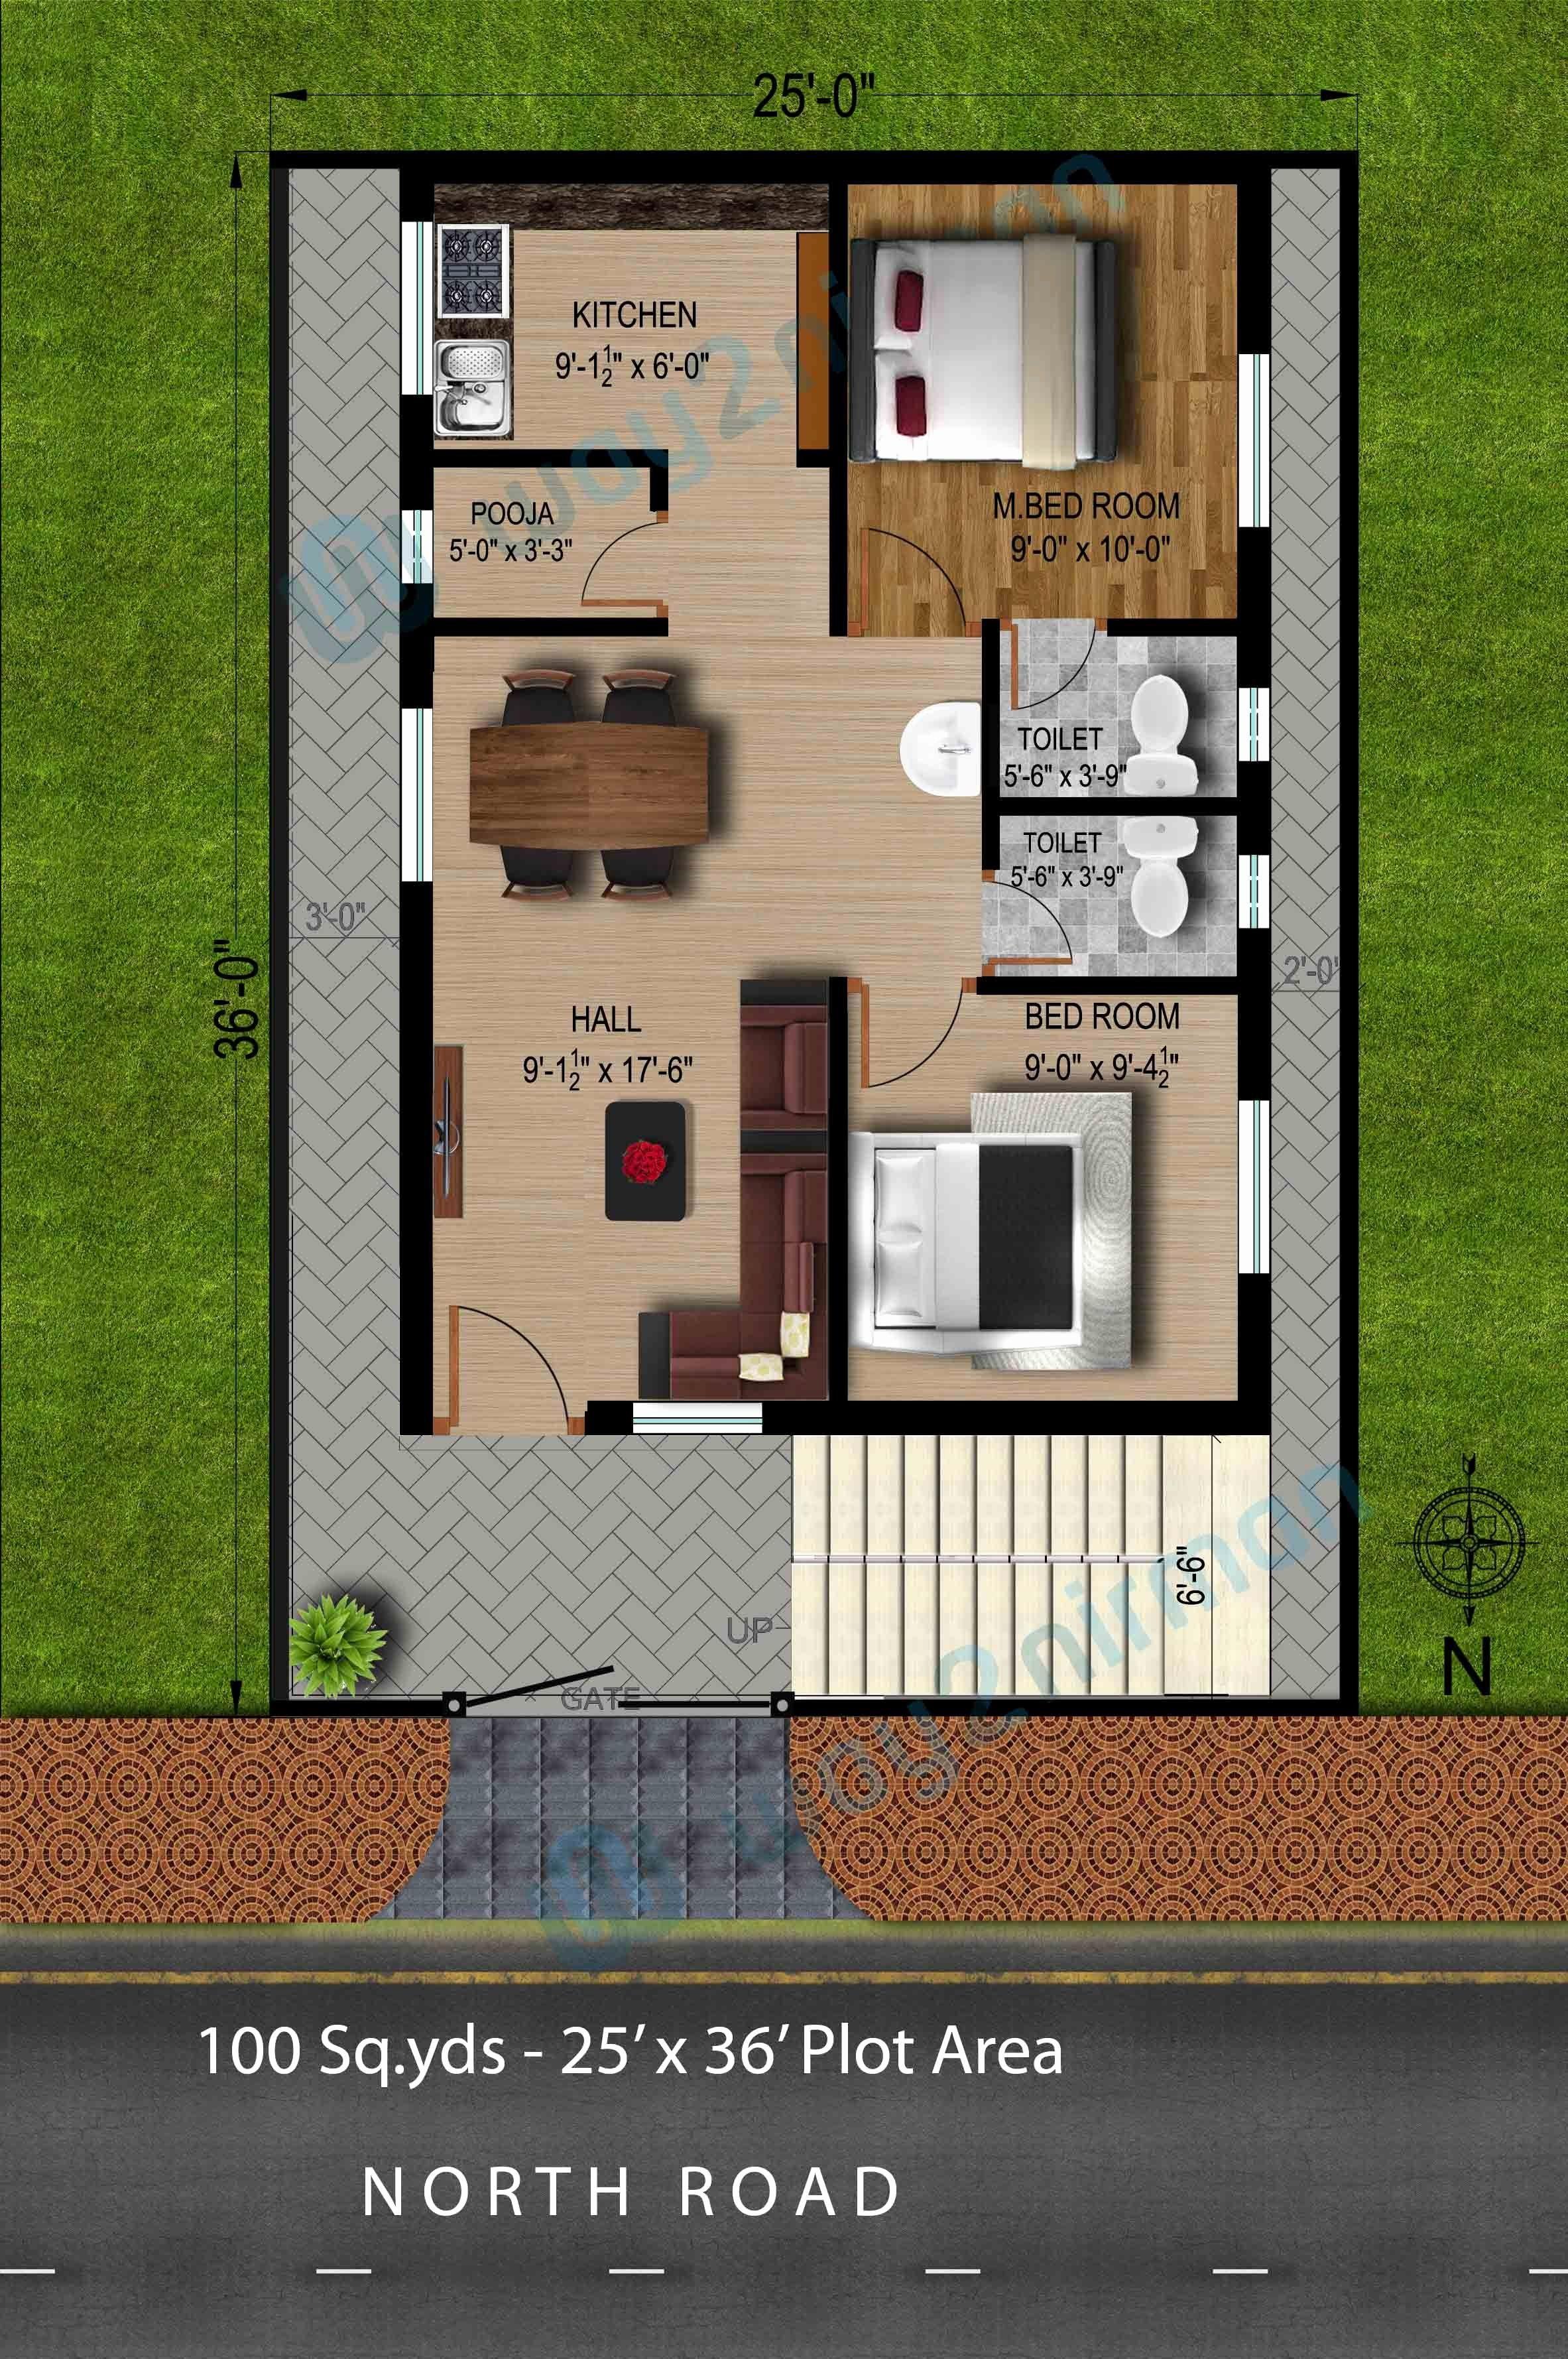 Tamilnadu house plans north facing home design  modern also best floor images in decor living room rh pinterest